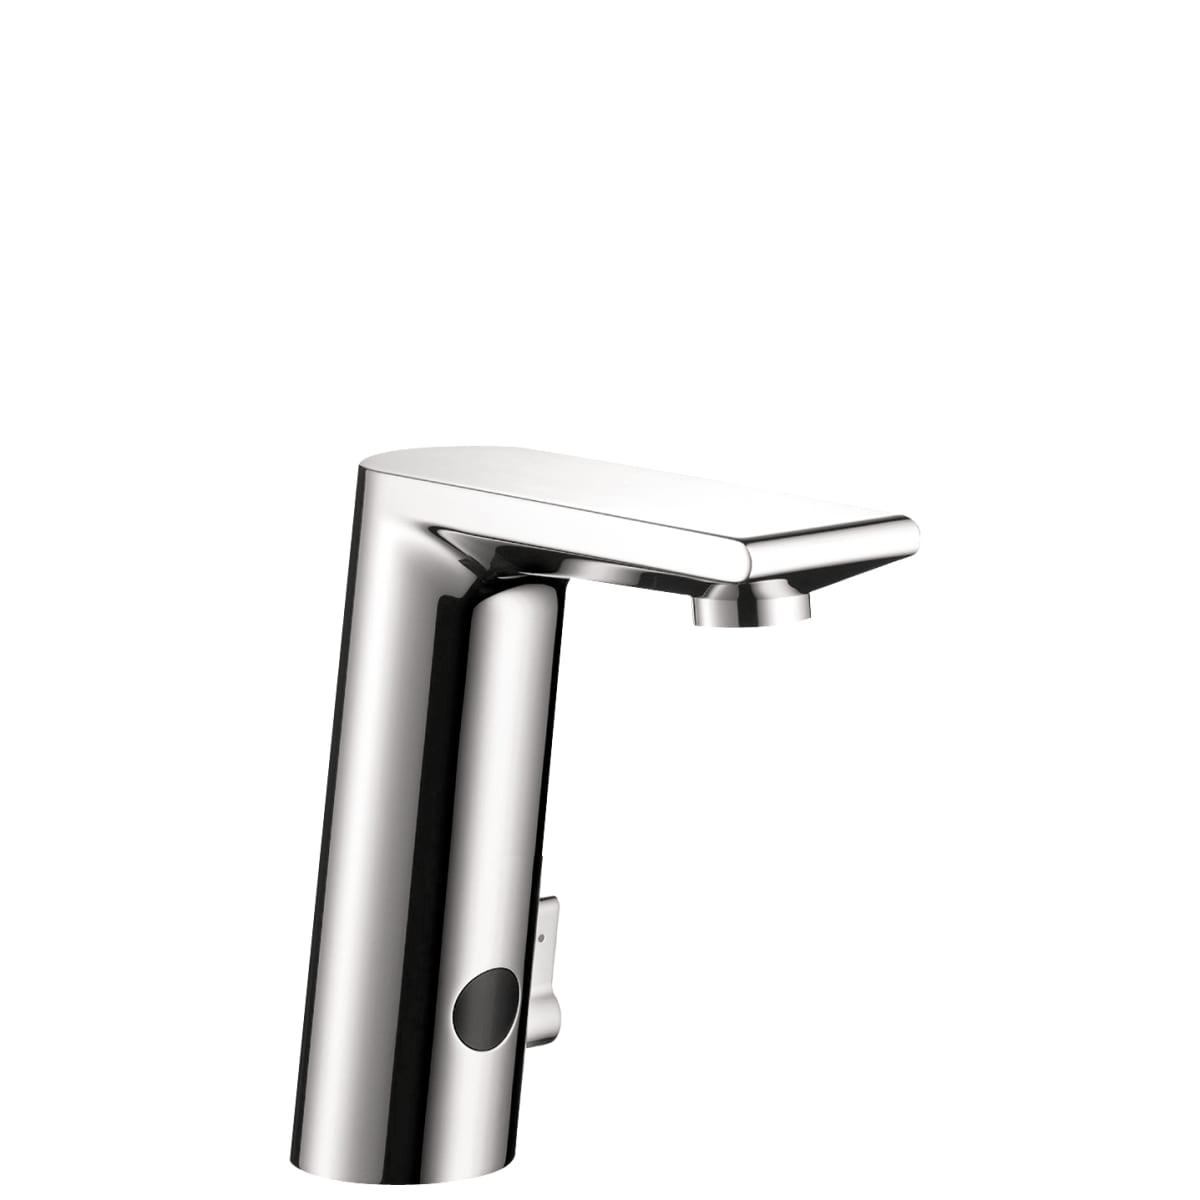 Hansgrohe 31100001 Chrome Metris S Electronic Bathroom